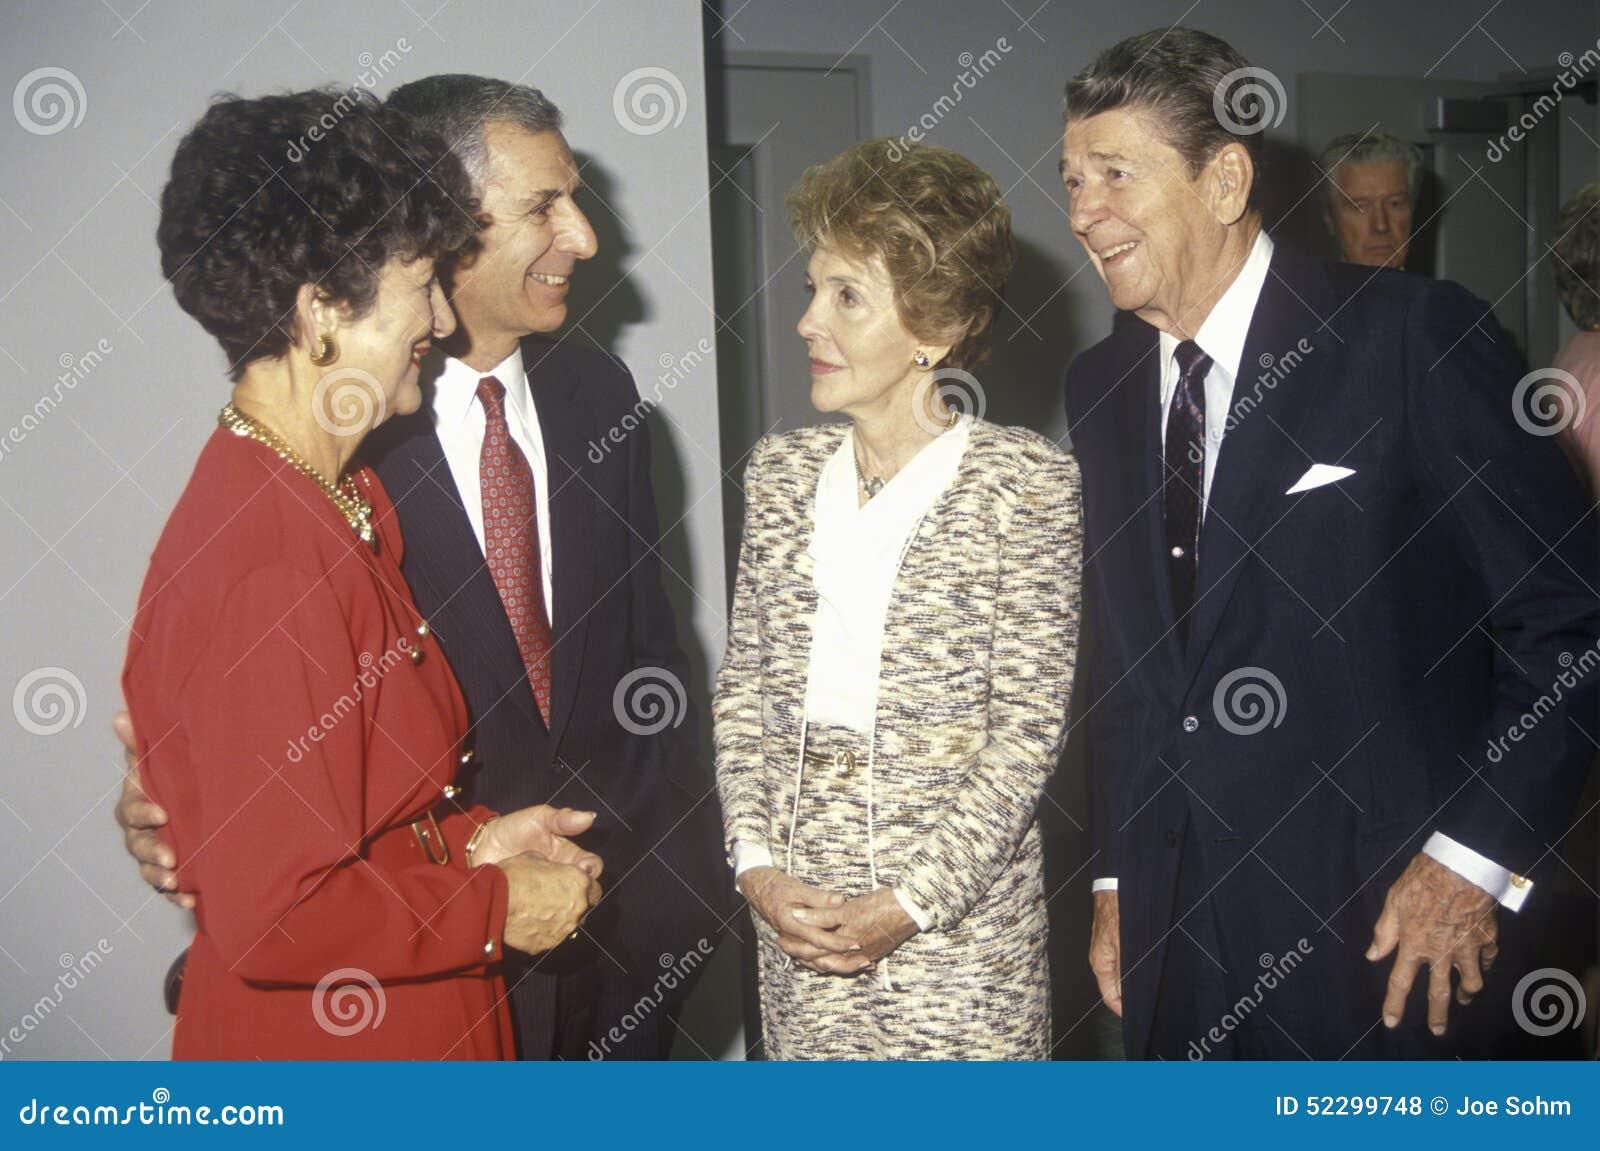 President Ronald Reagan, Mrs. Reagan, California governor George Deukmejian and wife